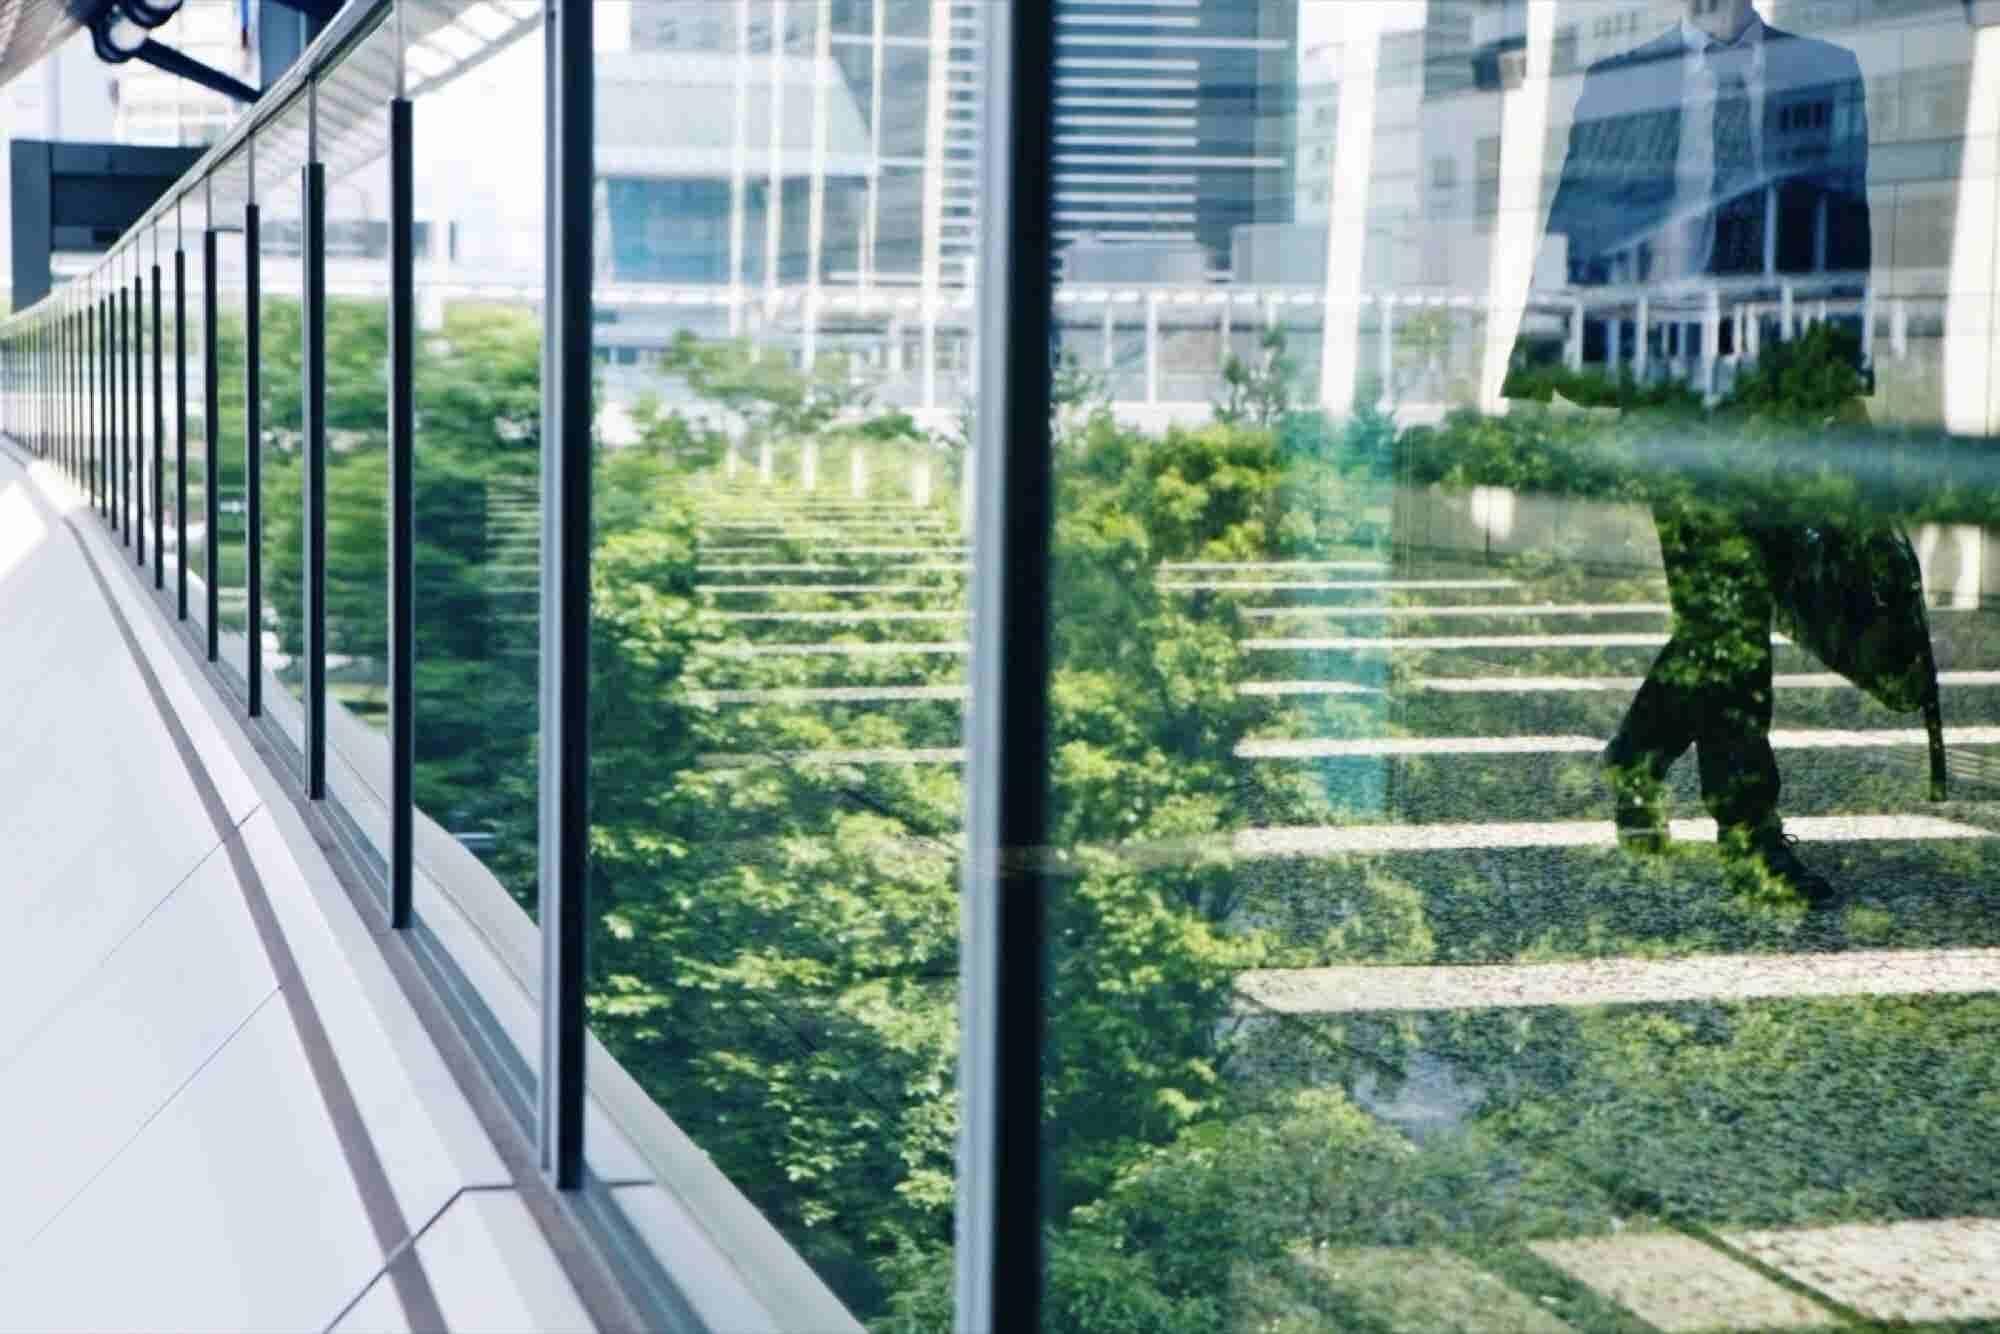 4 Ways Entrepreneurs Can Practice 'Conscious Capitalism'